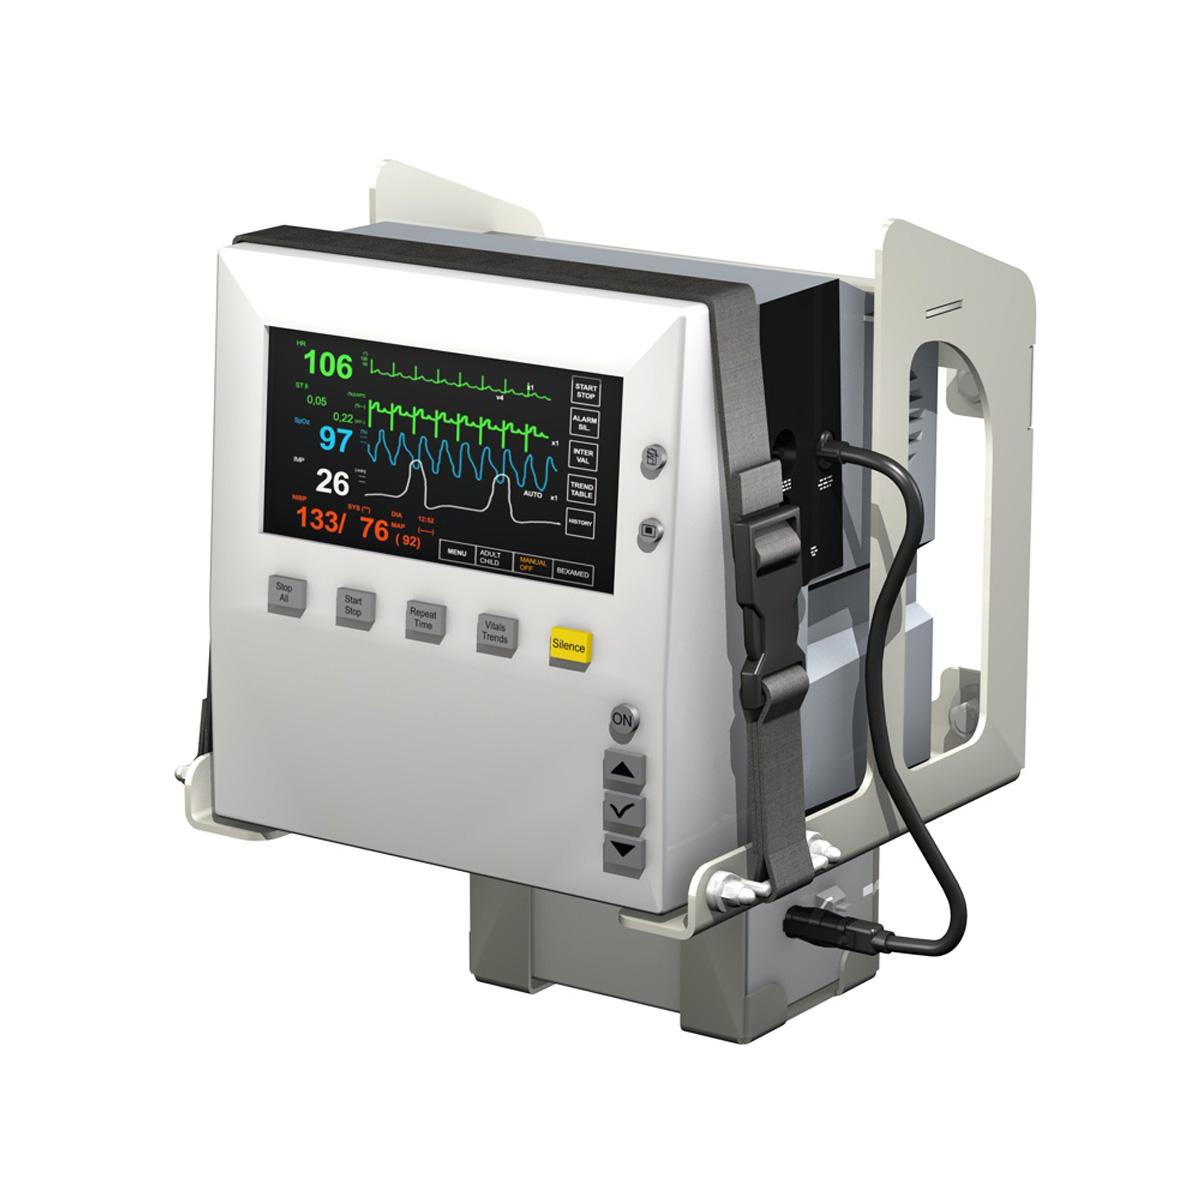 Monitor i pacientit 3d model 3ds c4d lwo obj 264445